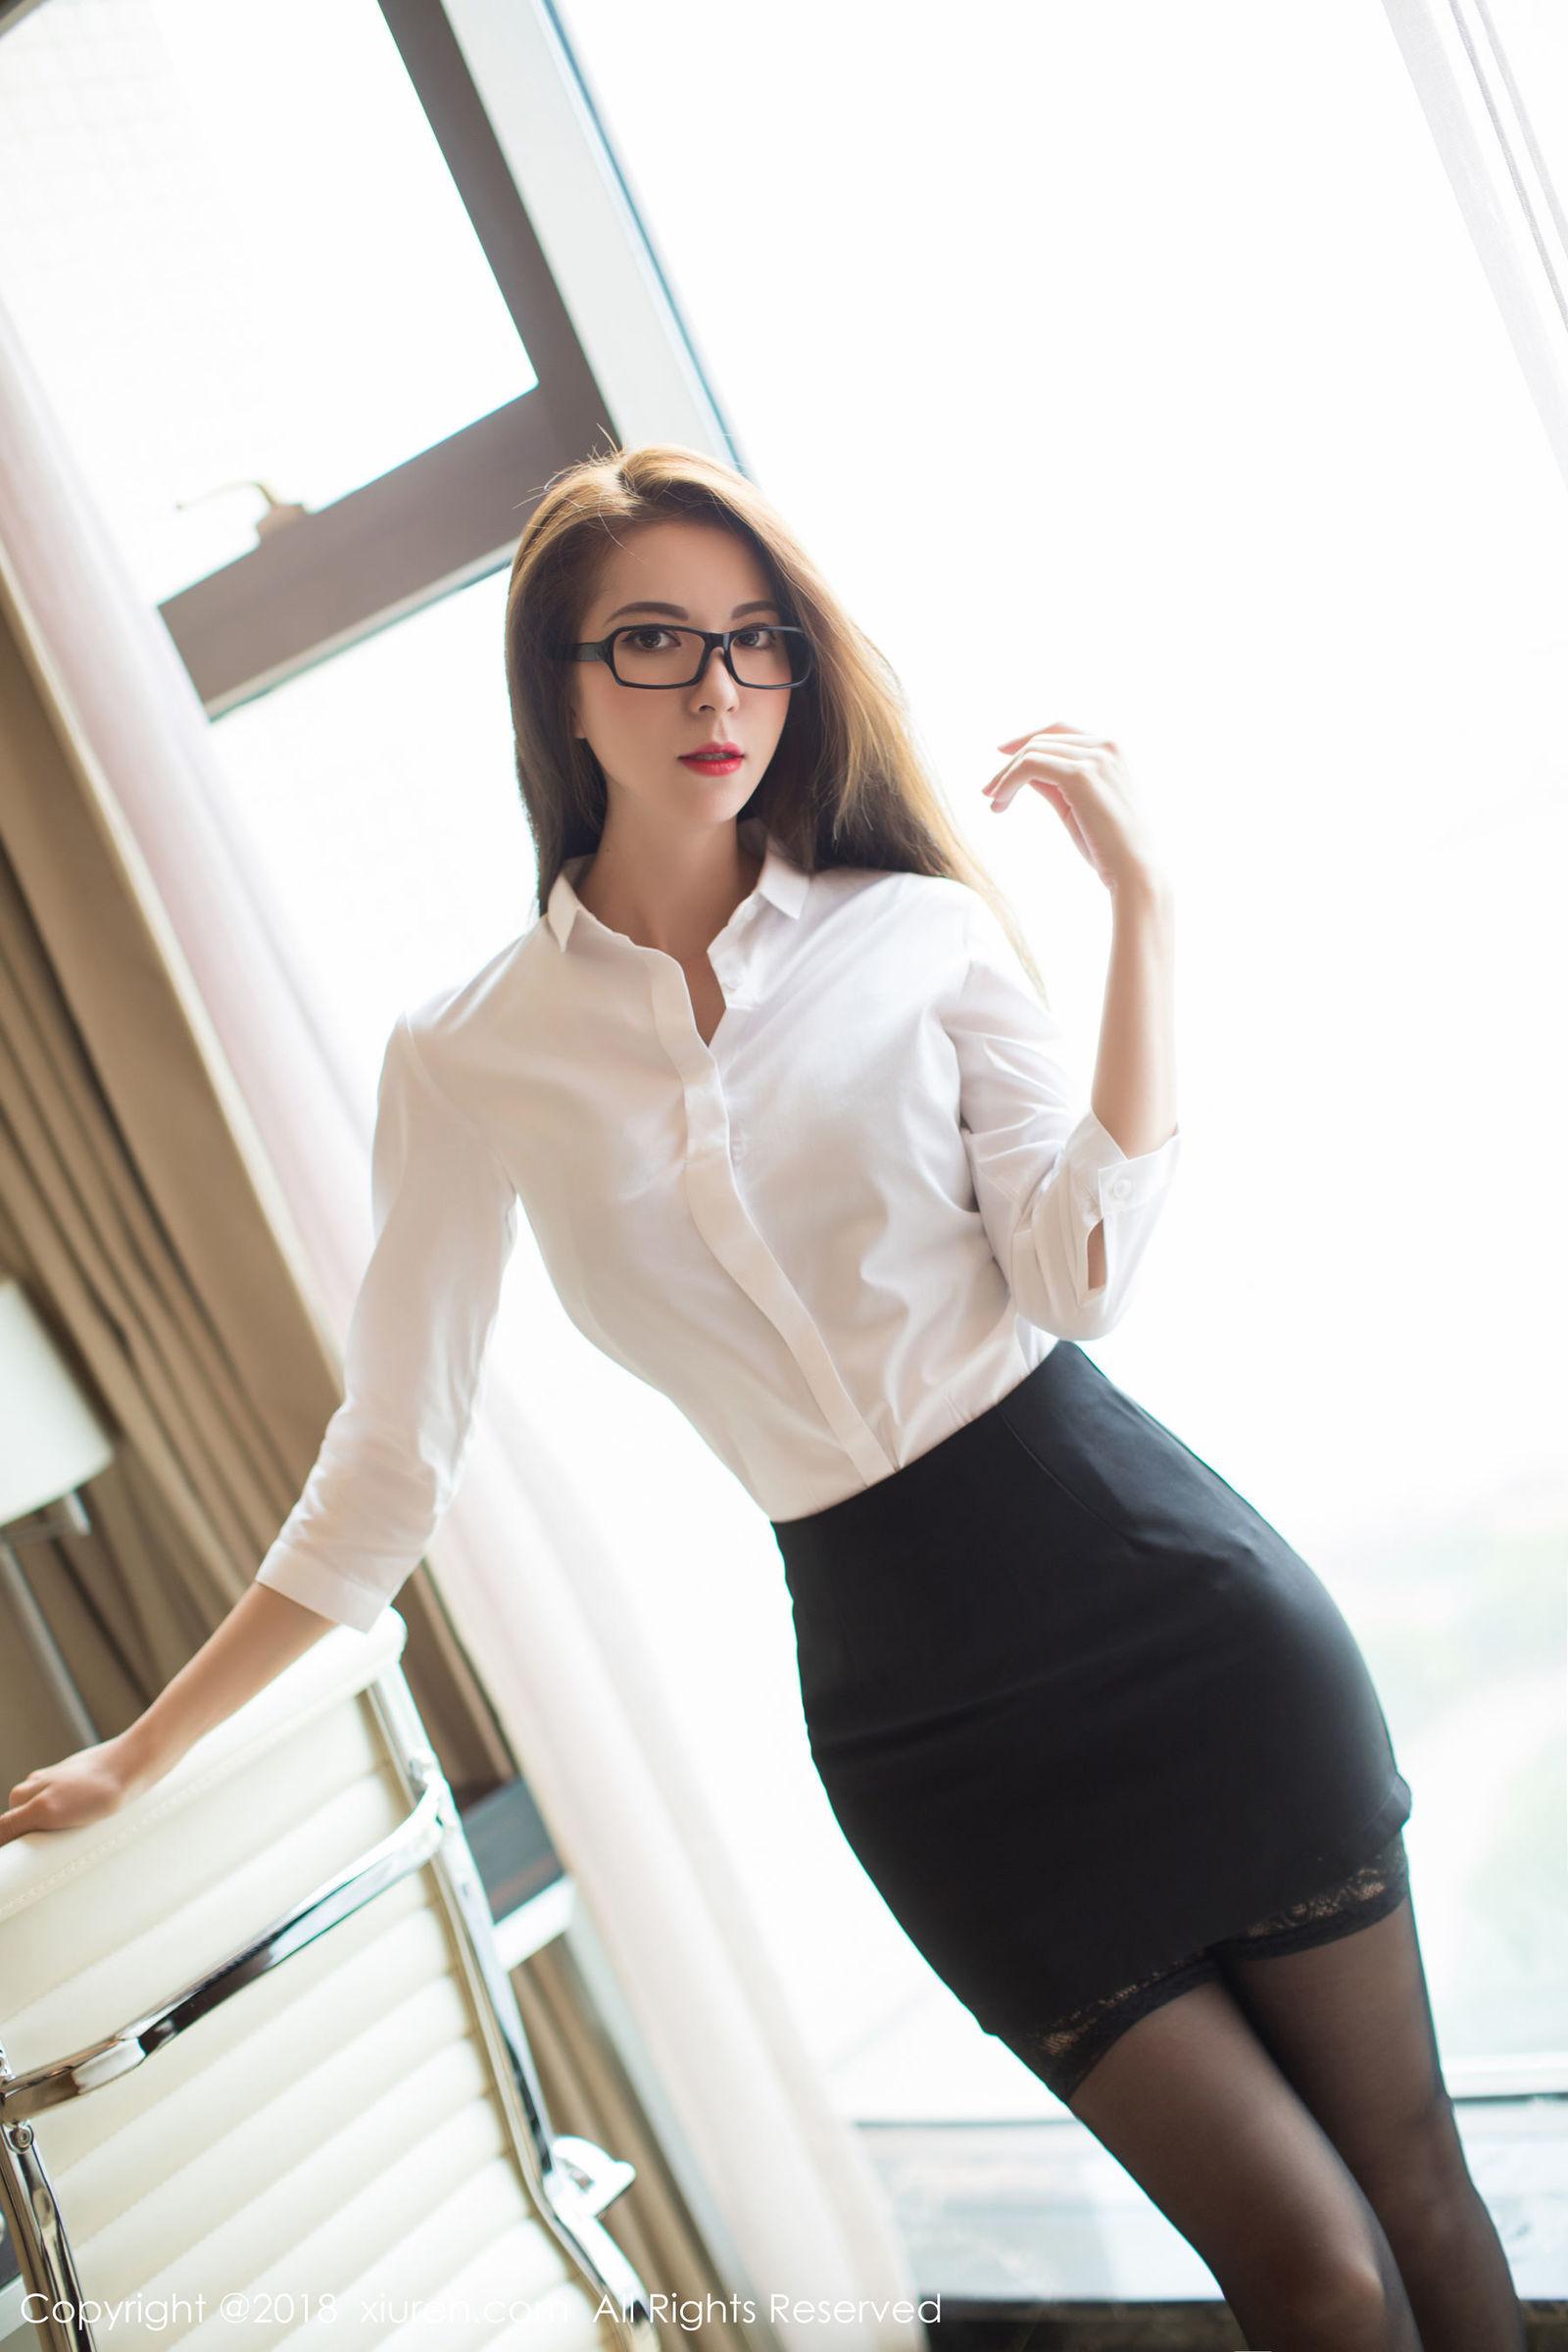 5IPT982亚洲嫩模杨晨晨情趣黑丝袜性感美臀美腿诱惑销魂美女图库